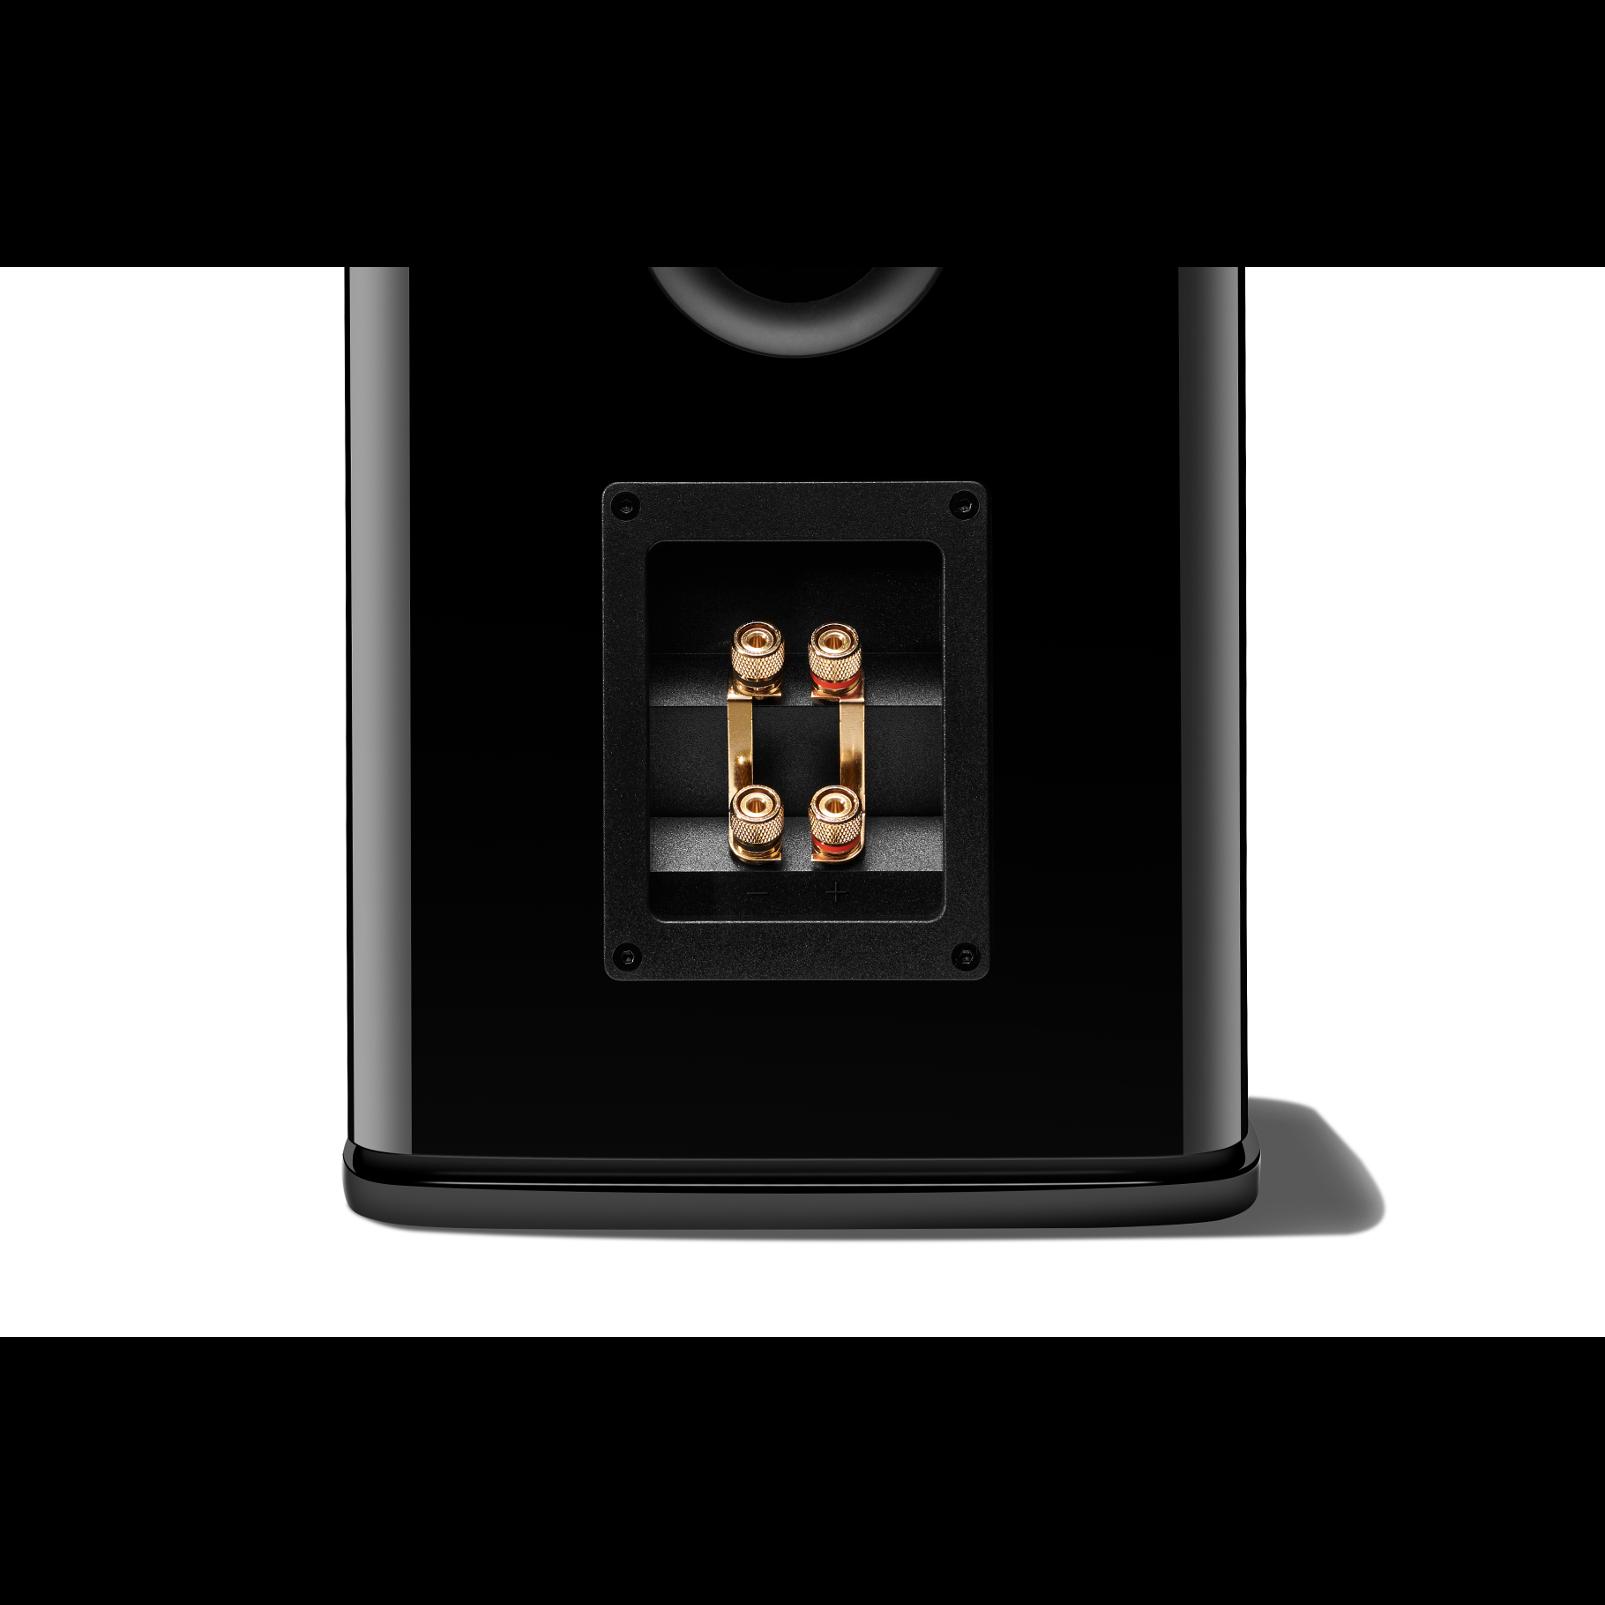 HDI-1600 - Black Gloss - 2-way 6.5-inch (165mm) Bookshelf Loudspeaker - Detailshot 3